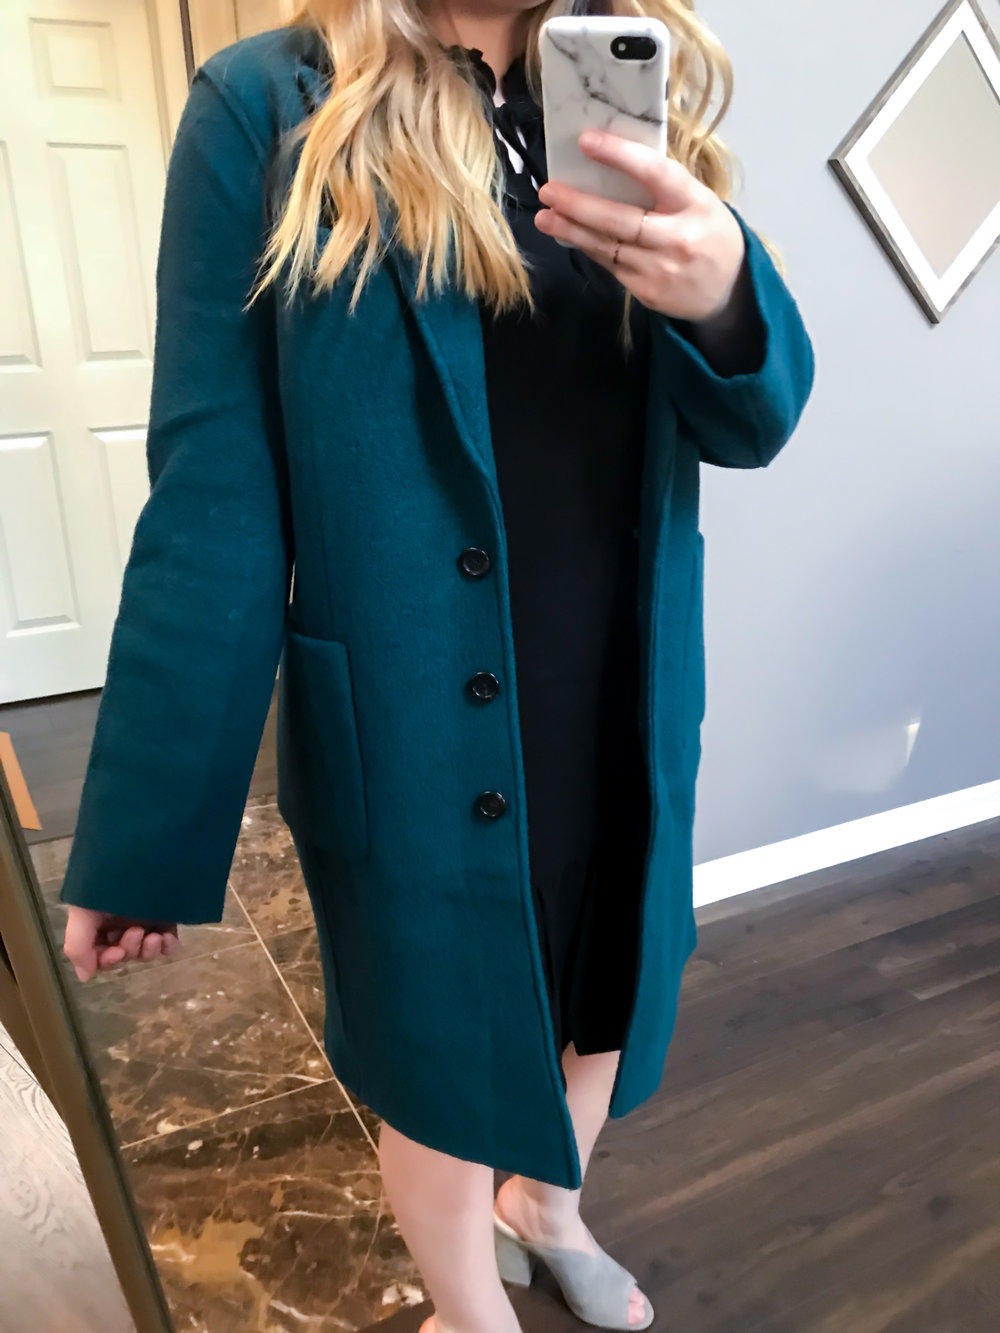 Maggie a la Mode Nordstrom Anniversary Sale 2018 J Crew Olga Boiled Wool Topcoat Winter Pine